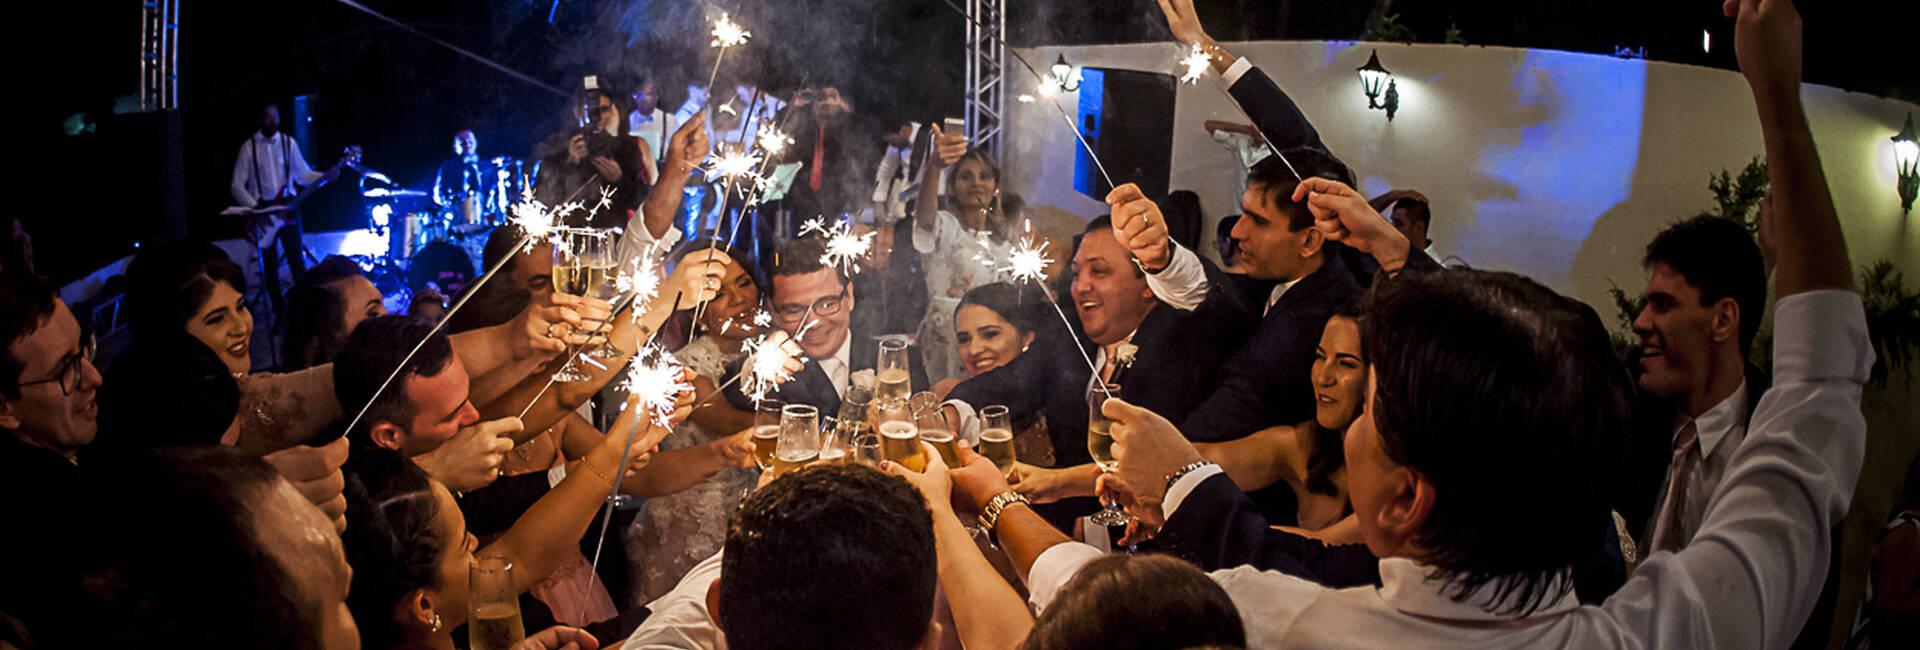 CASAMENTO | WEDDING de MARIA + ALEX